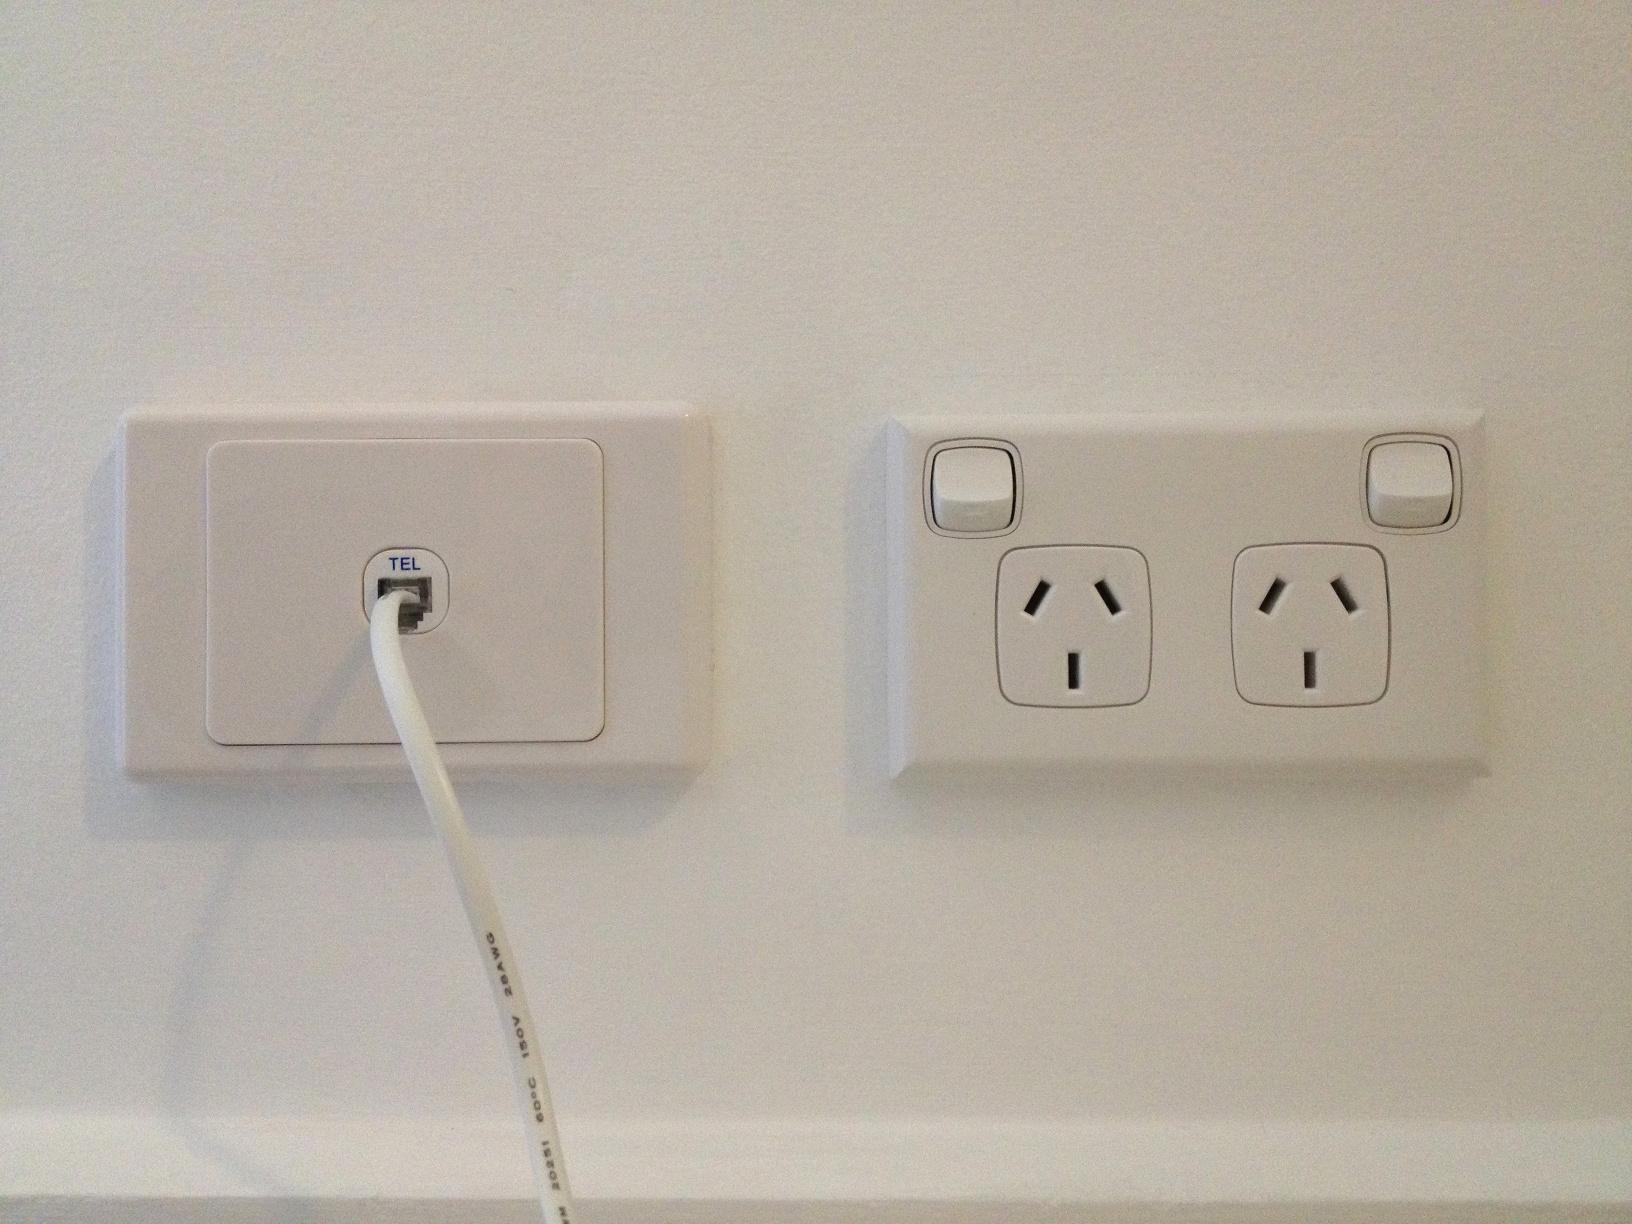 medium resolution of upgrading a 600 series phone socket to rj11 tp69 socket outlet google on australian telephone wall socket wiring